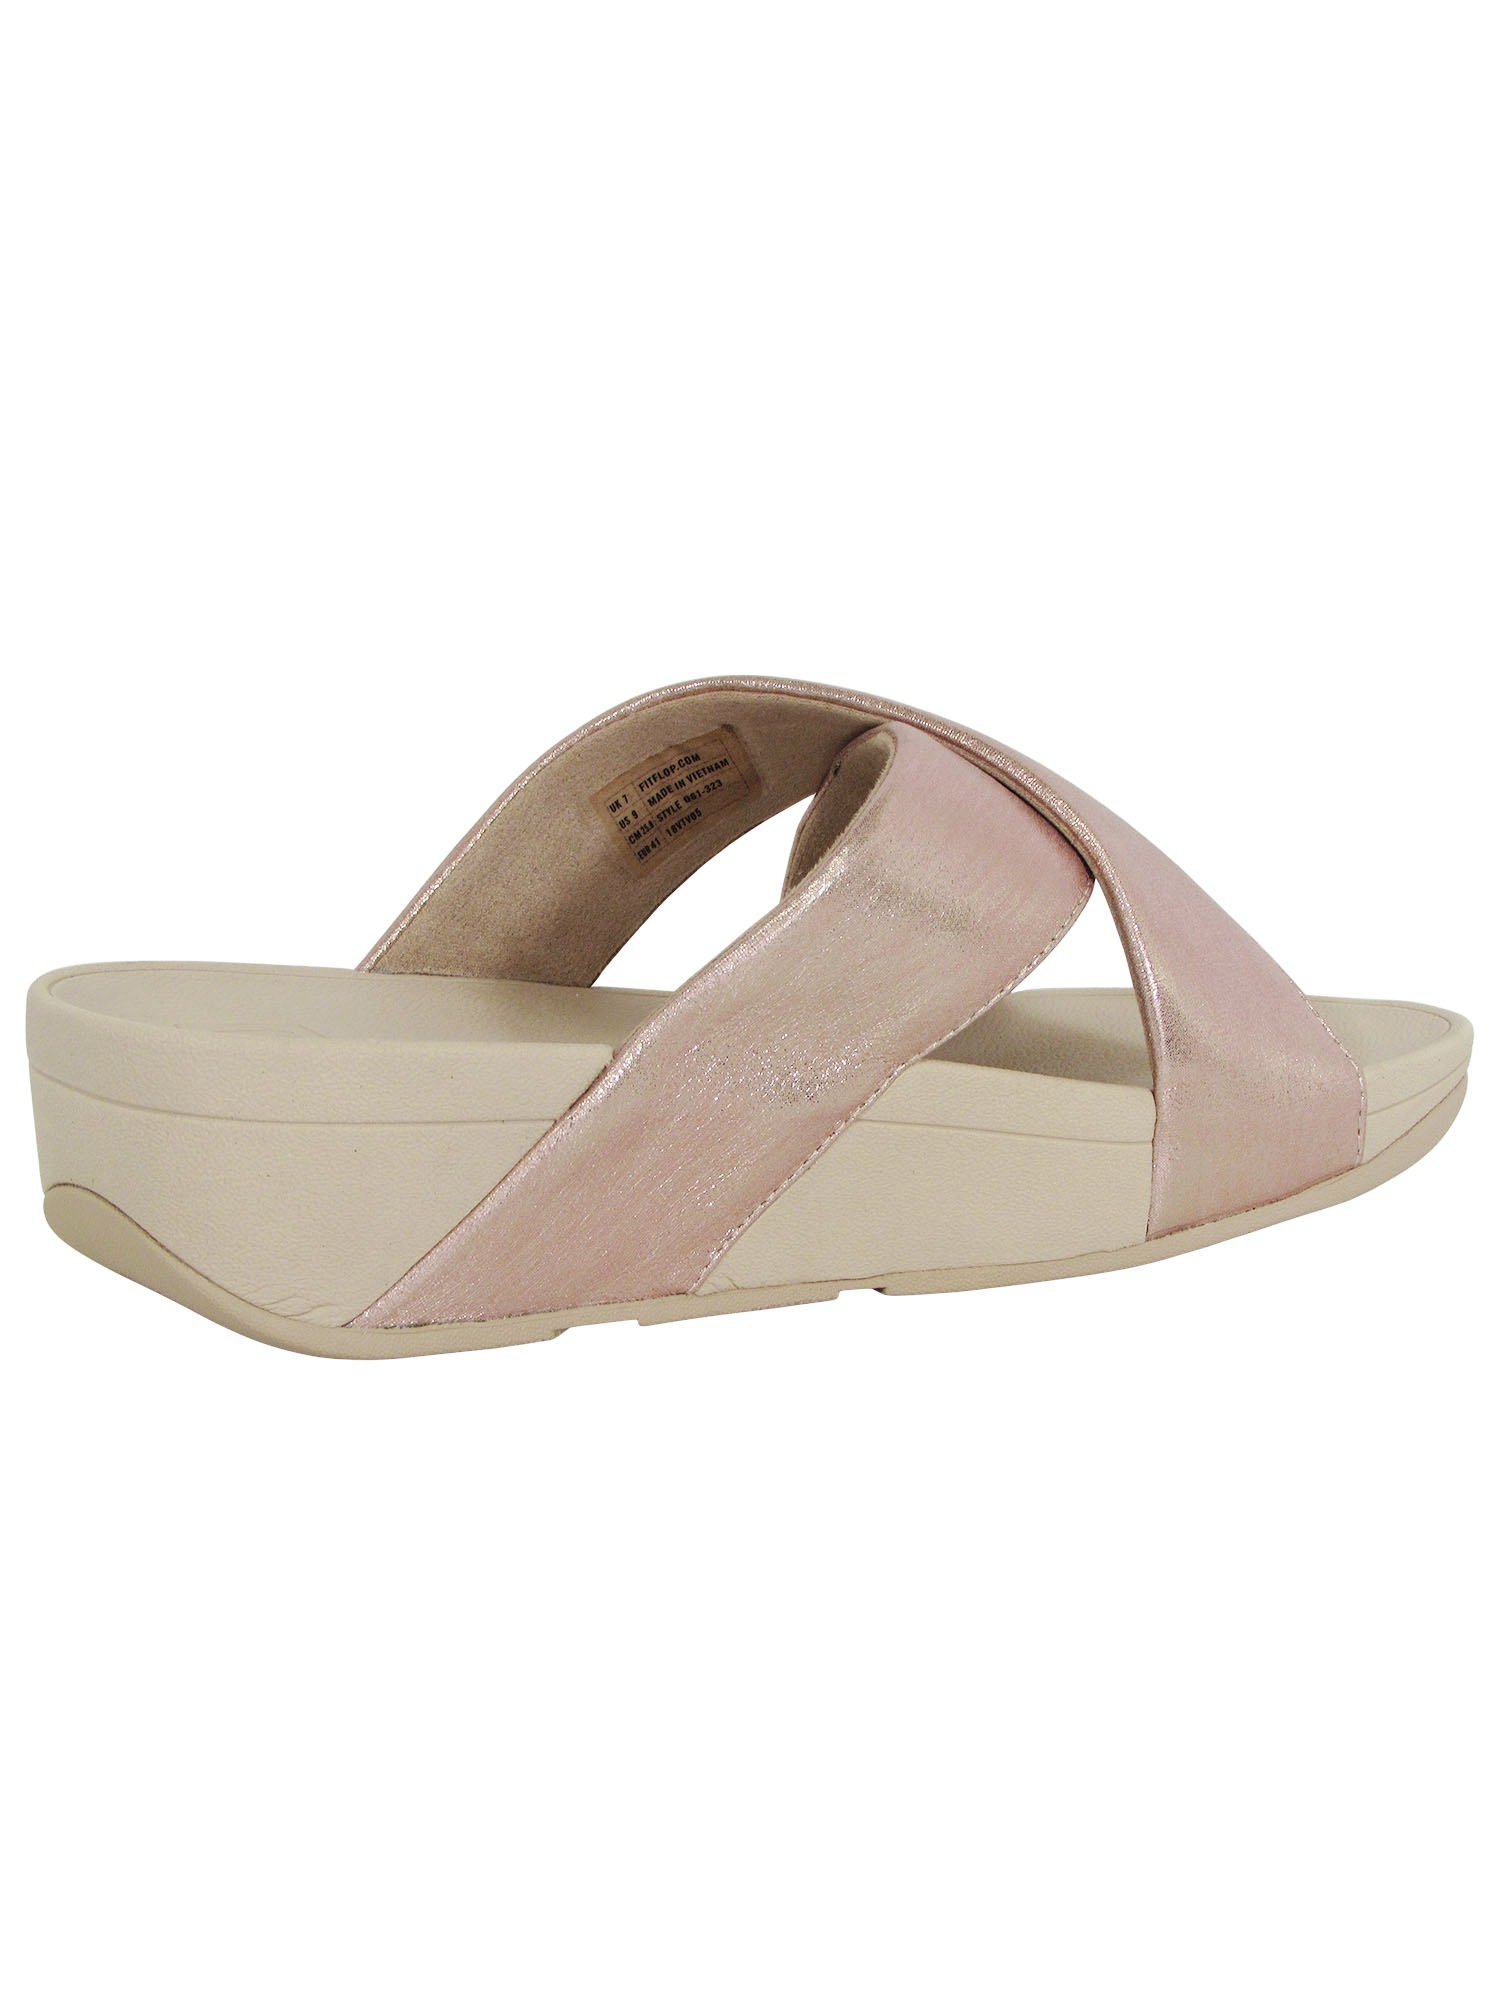 Fitflop-Womens-Lulu-Cross-Glitz-Slide-Sandal-Shoes thumbnail 16